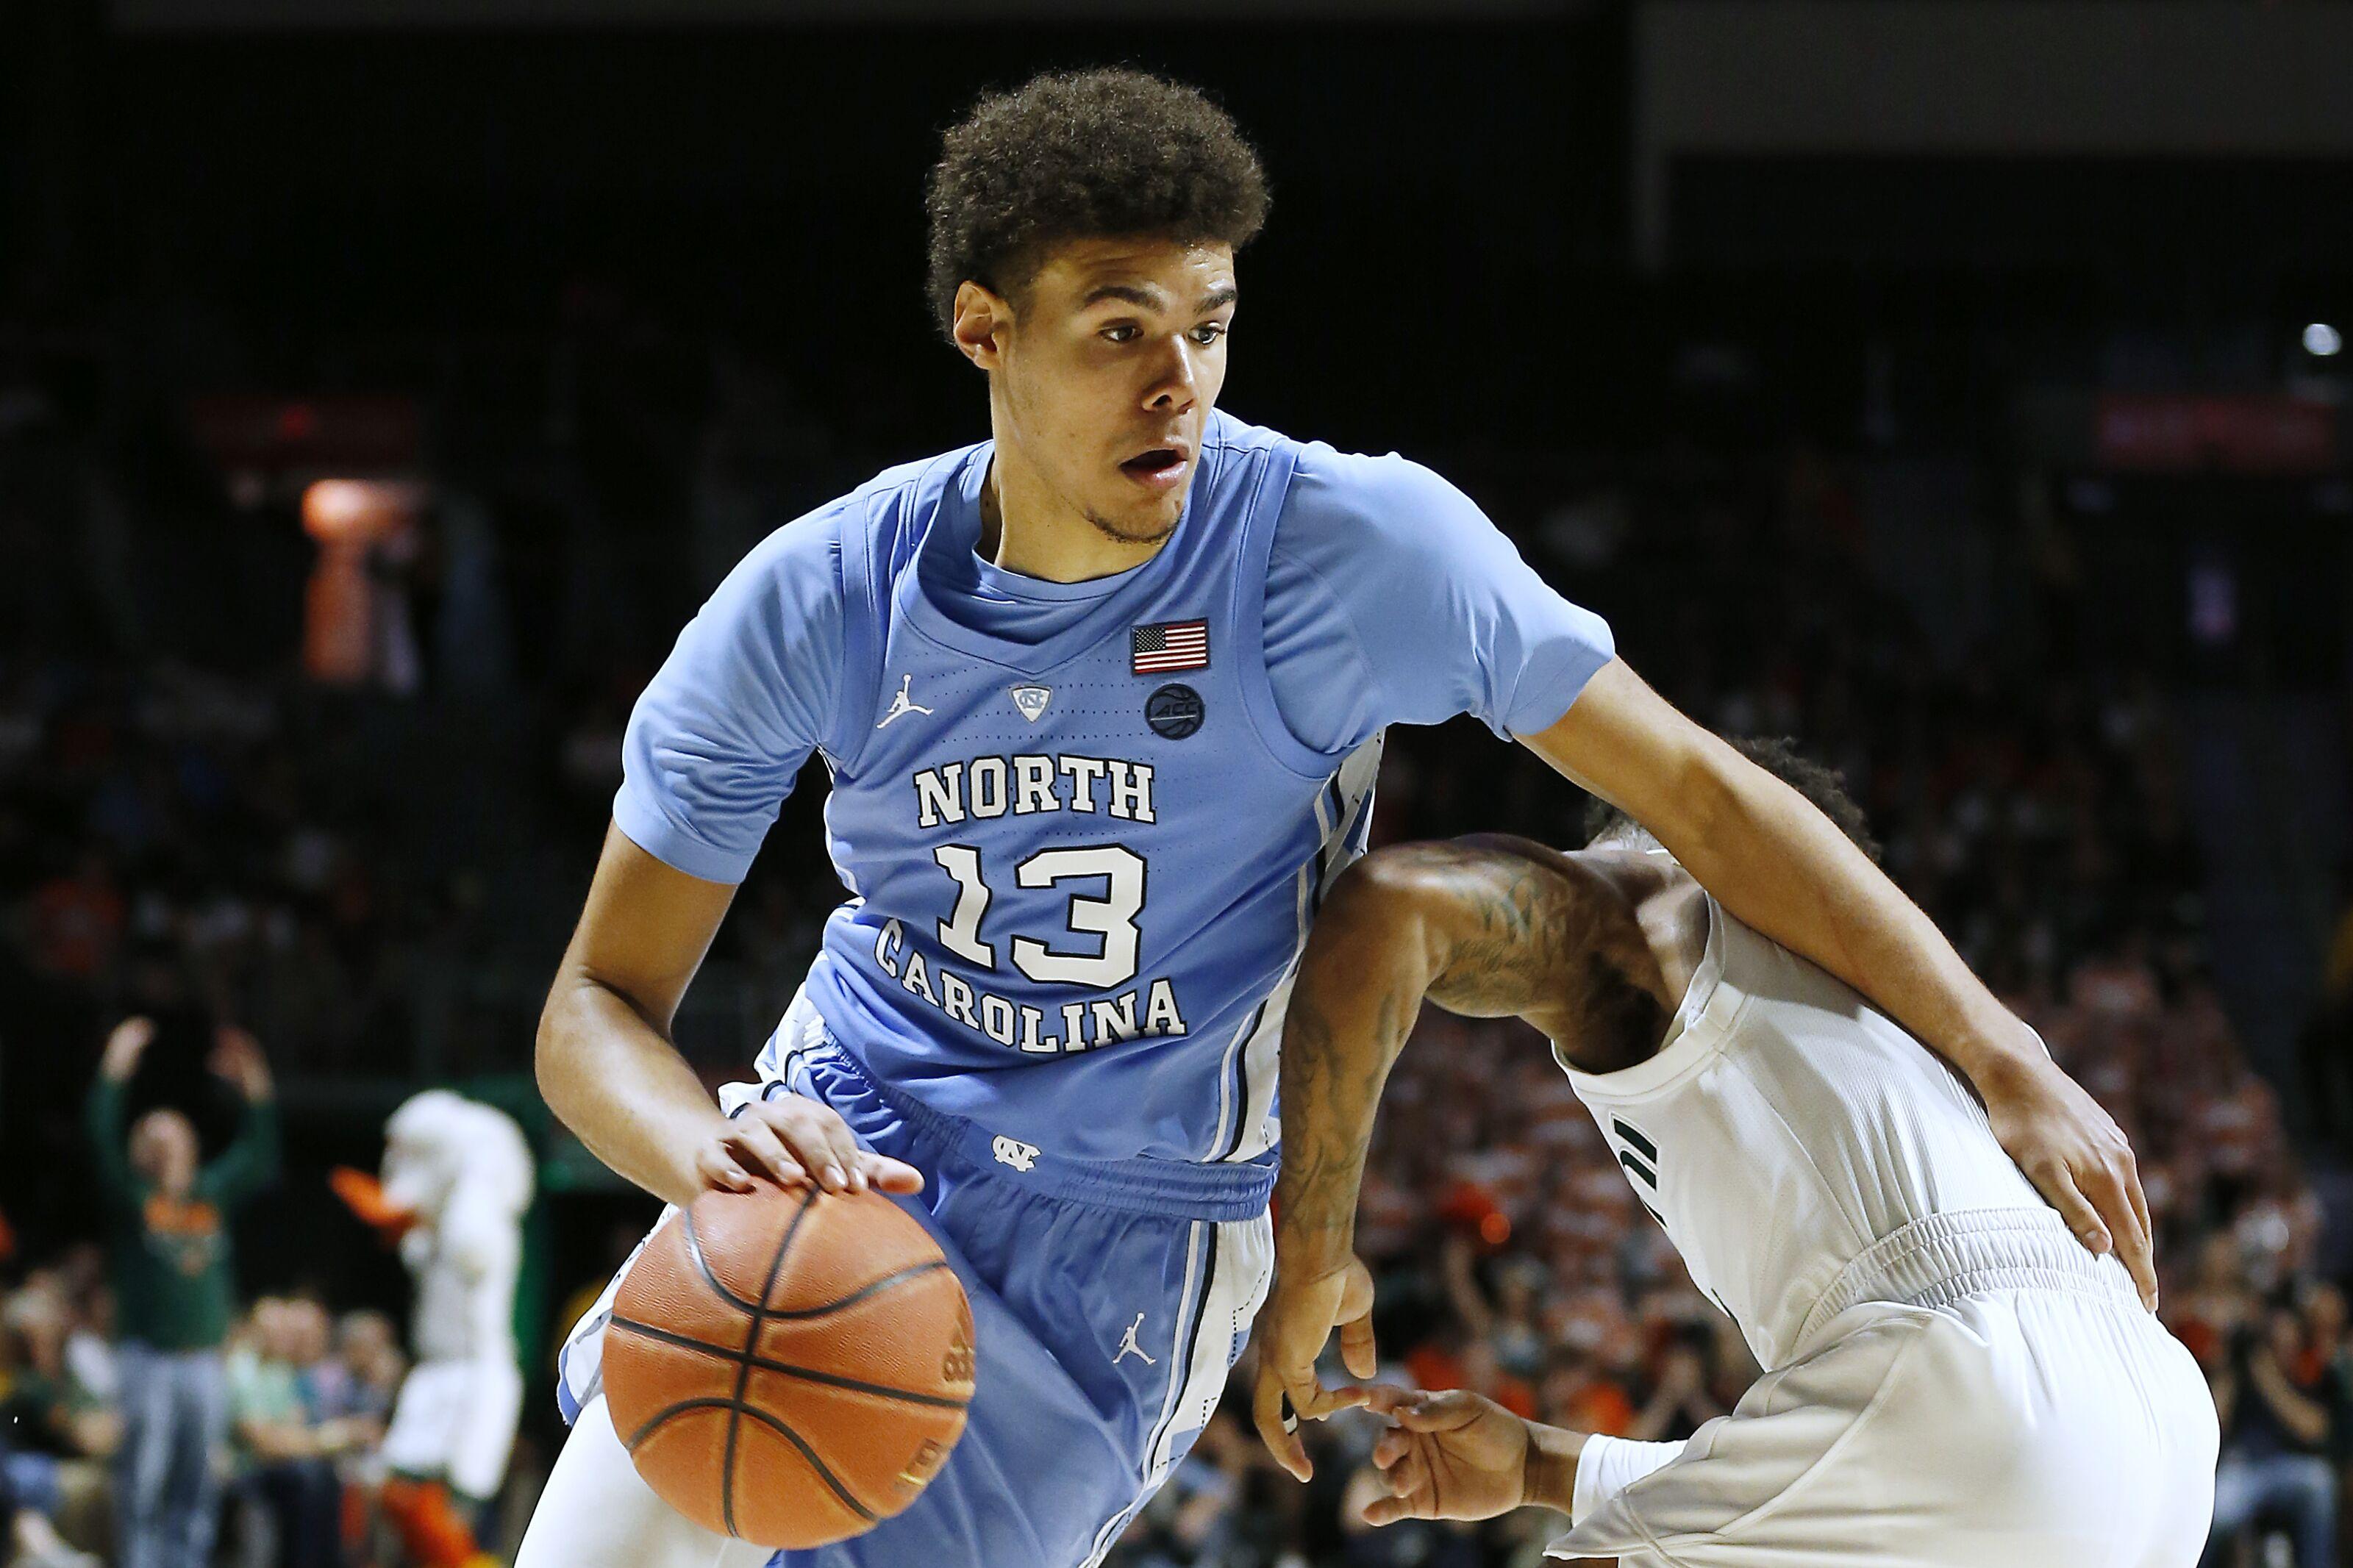 UNC Basketball: Johnson, Maye named to Naismith Midseason Team